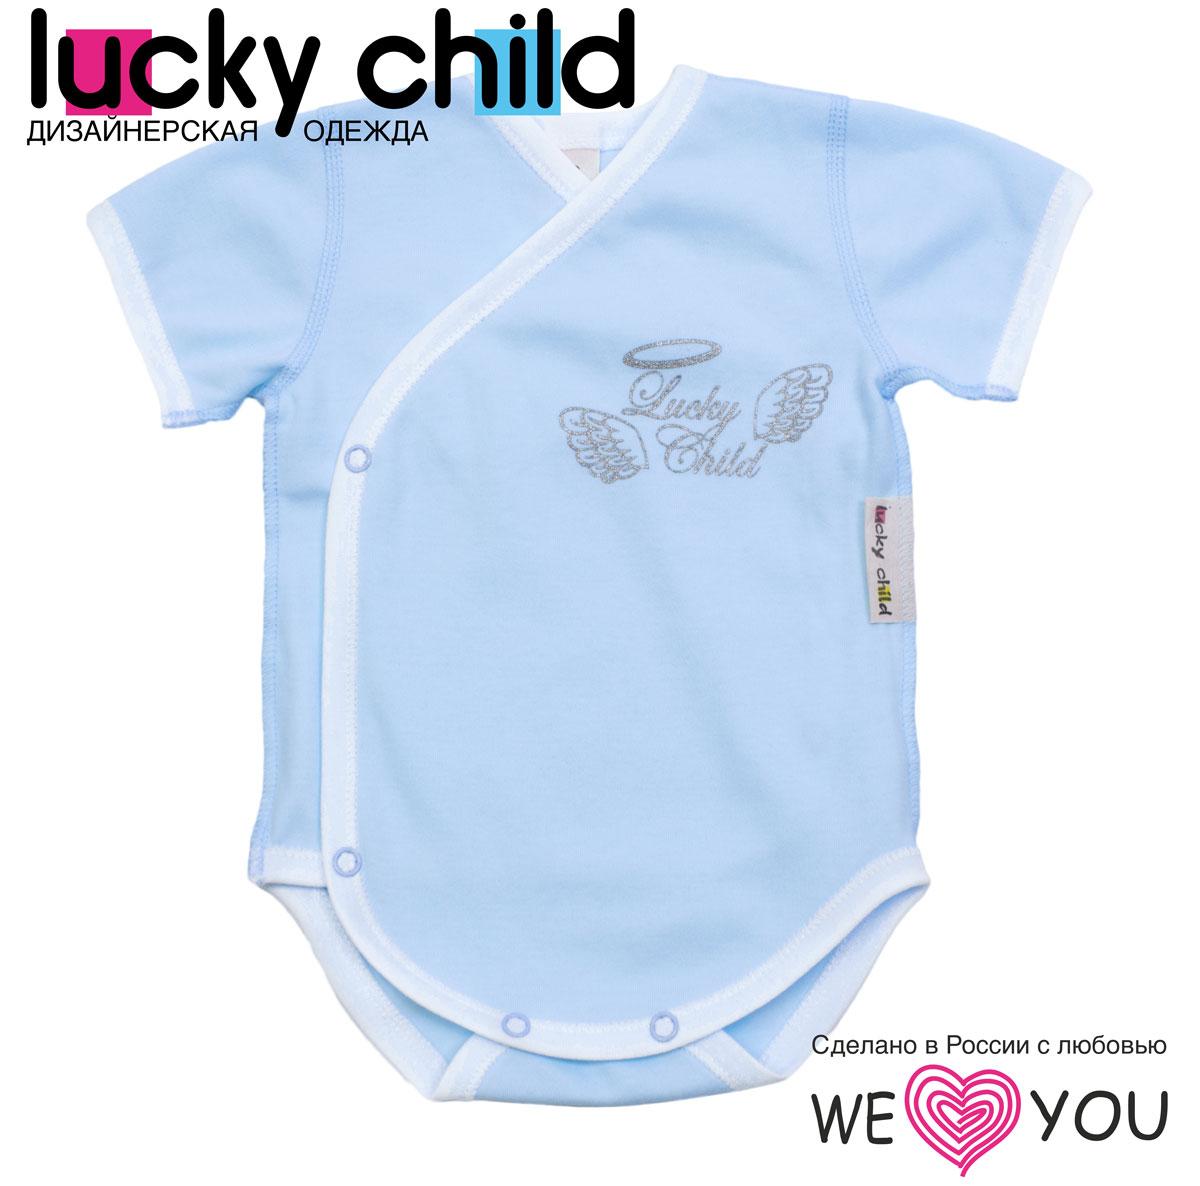 ����-�������� ������� ������. 17-51 - Lucky Child - Lucky Child17-51������� ����-�������� Lucky Child ������ � ��������� �������� �������� ��������� ����������� � ��������� ������ � ������ ����� ����, ����������� ��� ���������� �������. ���� ����������� �� ��������� - ������������ ������, ��������� ���� ��� ���������� ������ � ������, �� ���������� ������ ���� ������� � ������ �������������, � ���������� ��� ������� ���� ������ � �� ������������ ��� ���������. ������� ��������-������ �� �������� ������� � �� ��������� �������� ����� ��������� �������� � ������� ���������. ���� �� ����� ��������� �������� � ���� �������� ������ � ������������ ��������, � �� ������ ��������� ������������ ����������, �������� ����������������� �����. ���� ��������� ������������� ������������ ����� ������ � ������ ������, �� ������� � �� ����������� ��� � ���������. � ��� ��� ������� ������ ����� � ������ ��������.